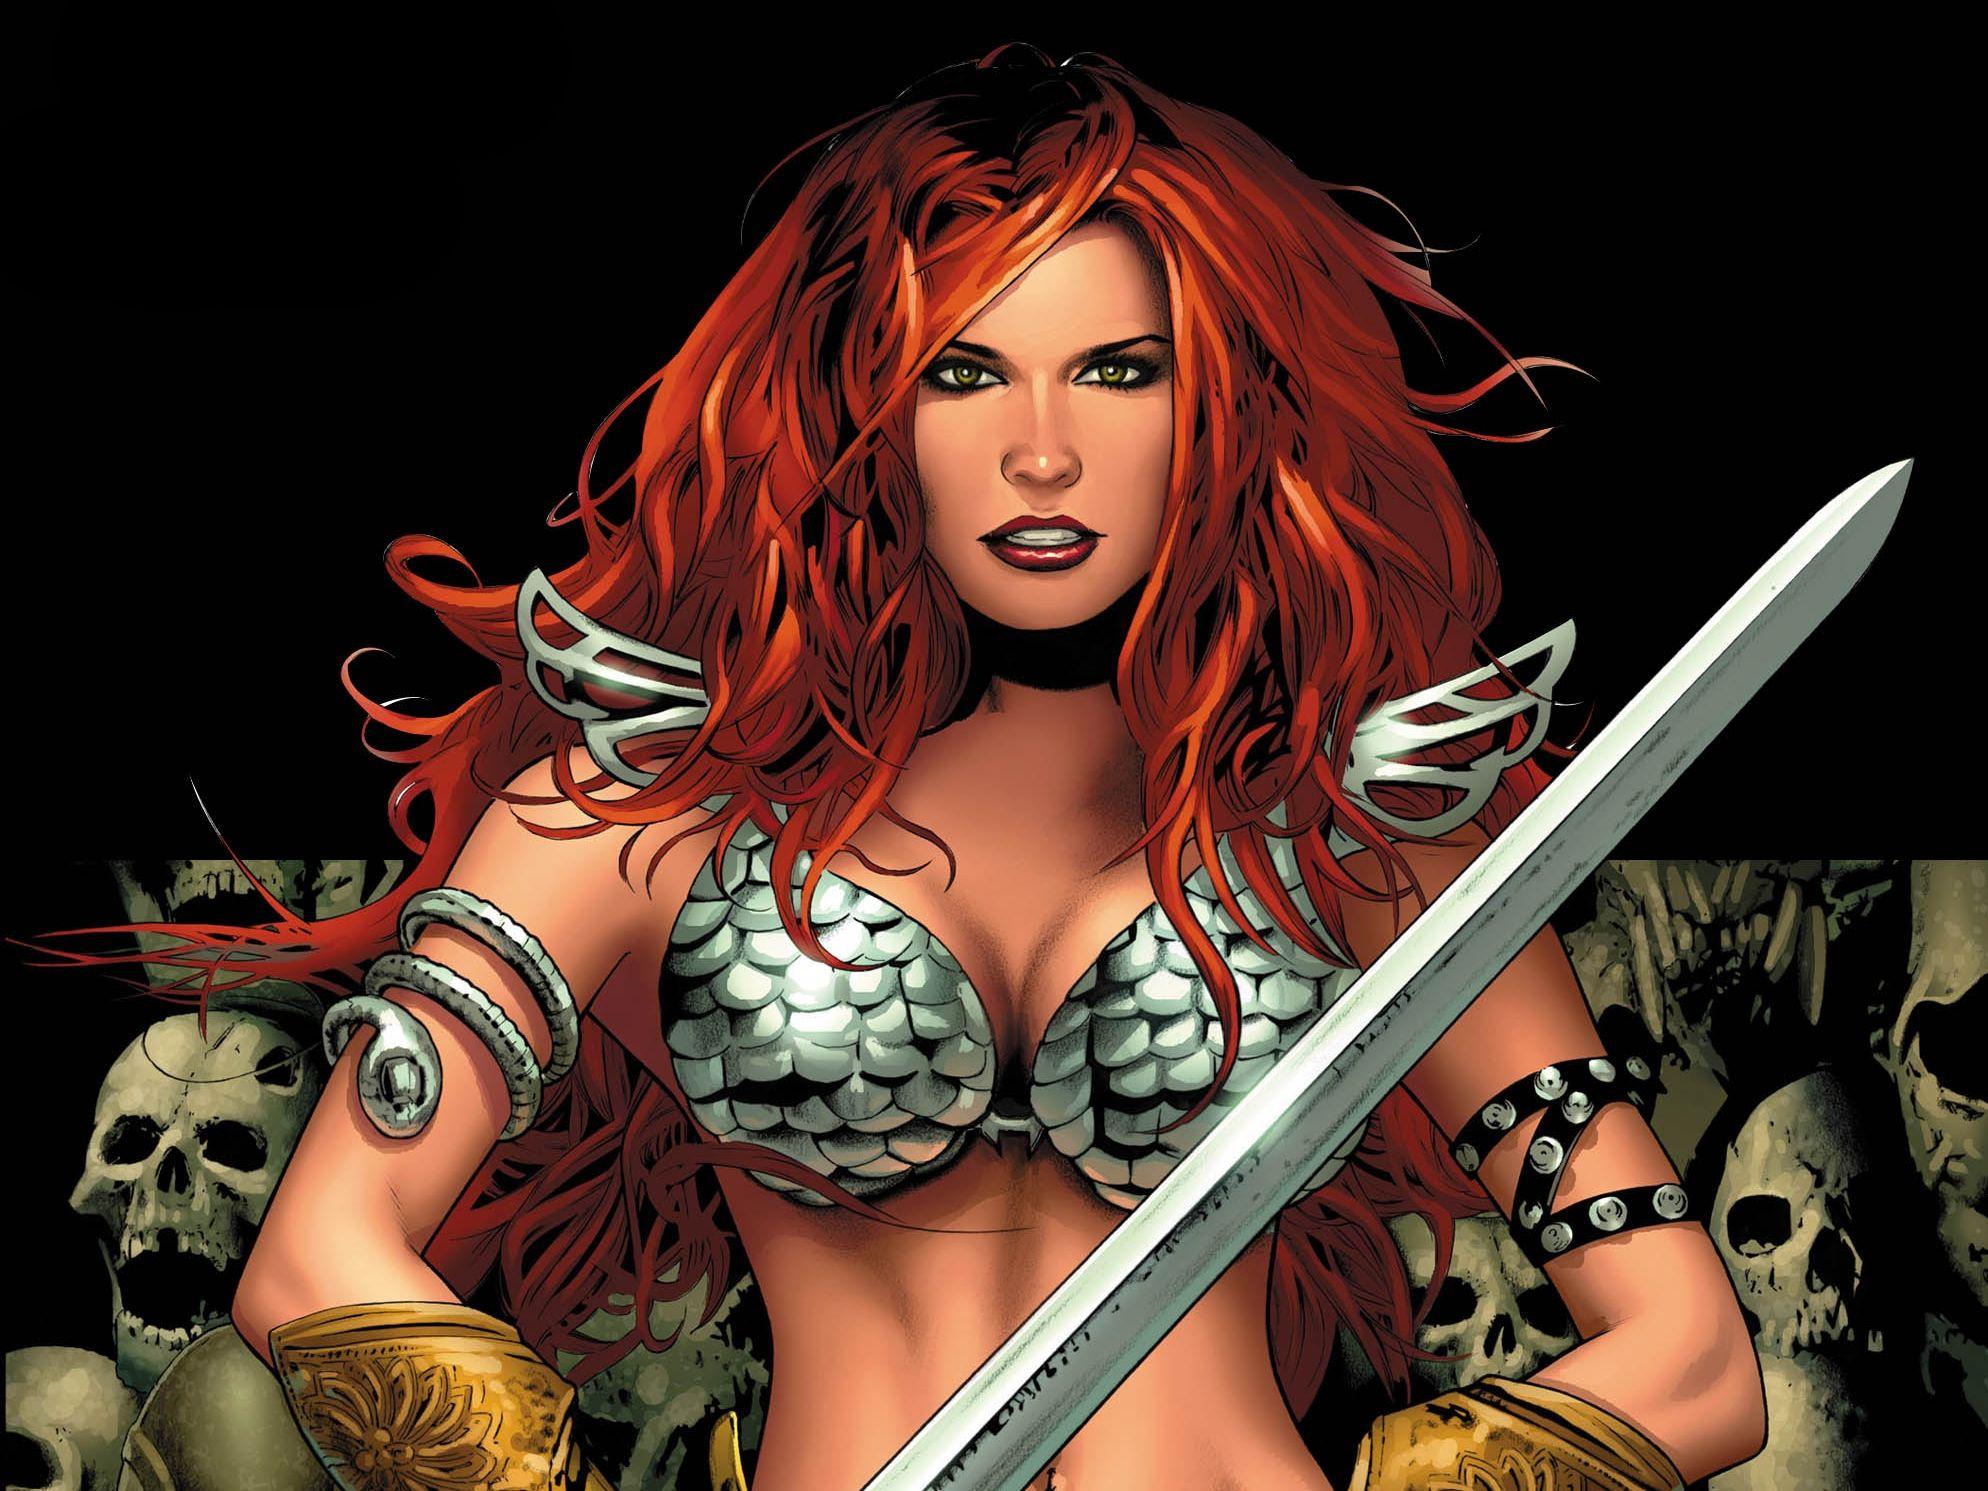 Red Sonja Computer Wallpapers Desktop Backgrounds 1988x1491 Id 446307 Red Sonja Superhero Costumes Female Warrior Woman